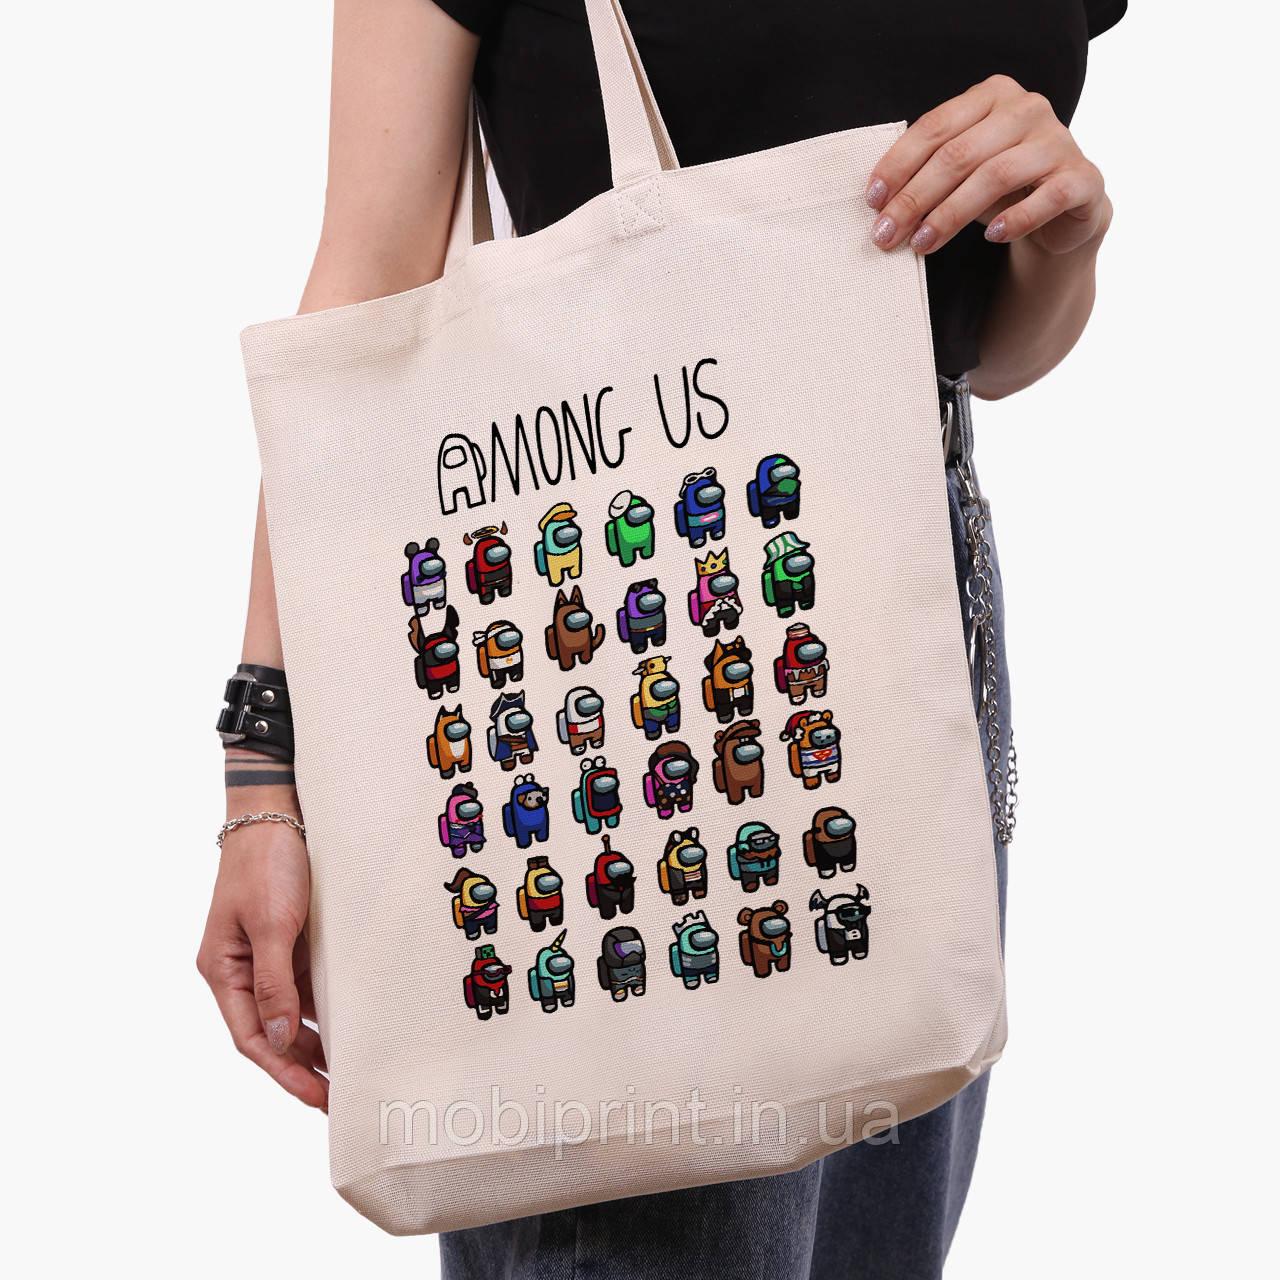 Еко сумка шоппер біла Амонг Ас (Among Us) (9227-2587-1) 41*39*8 см